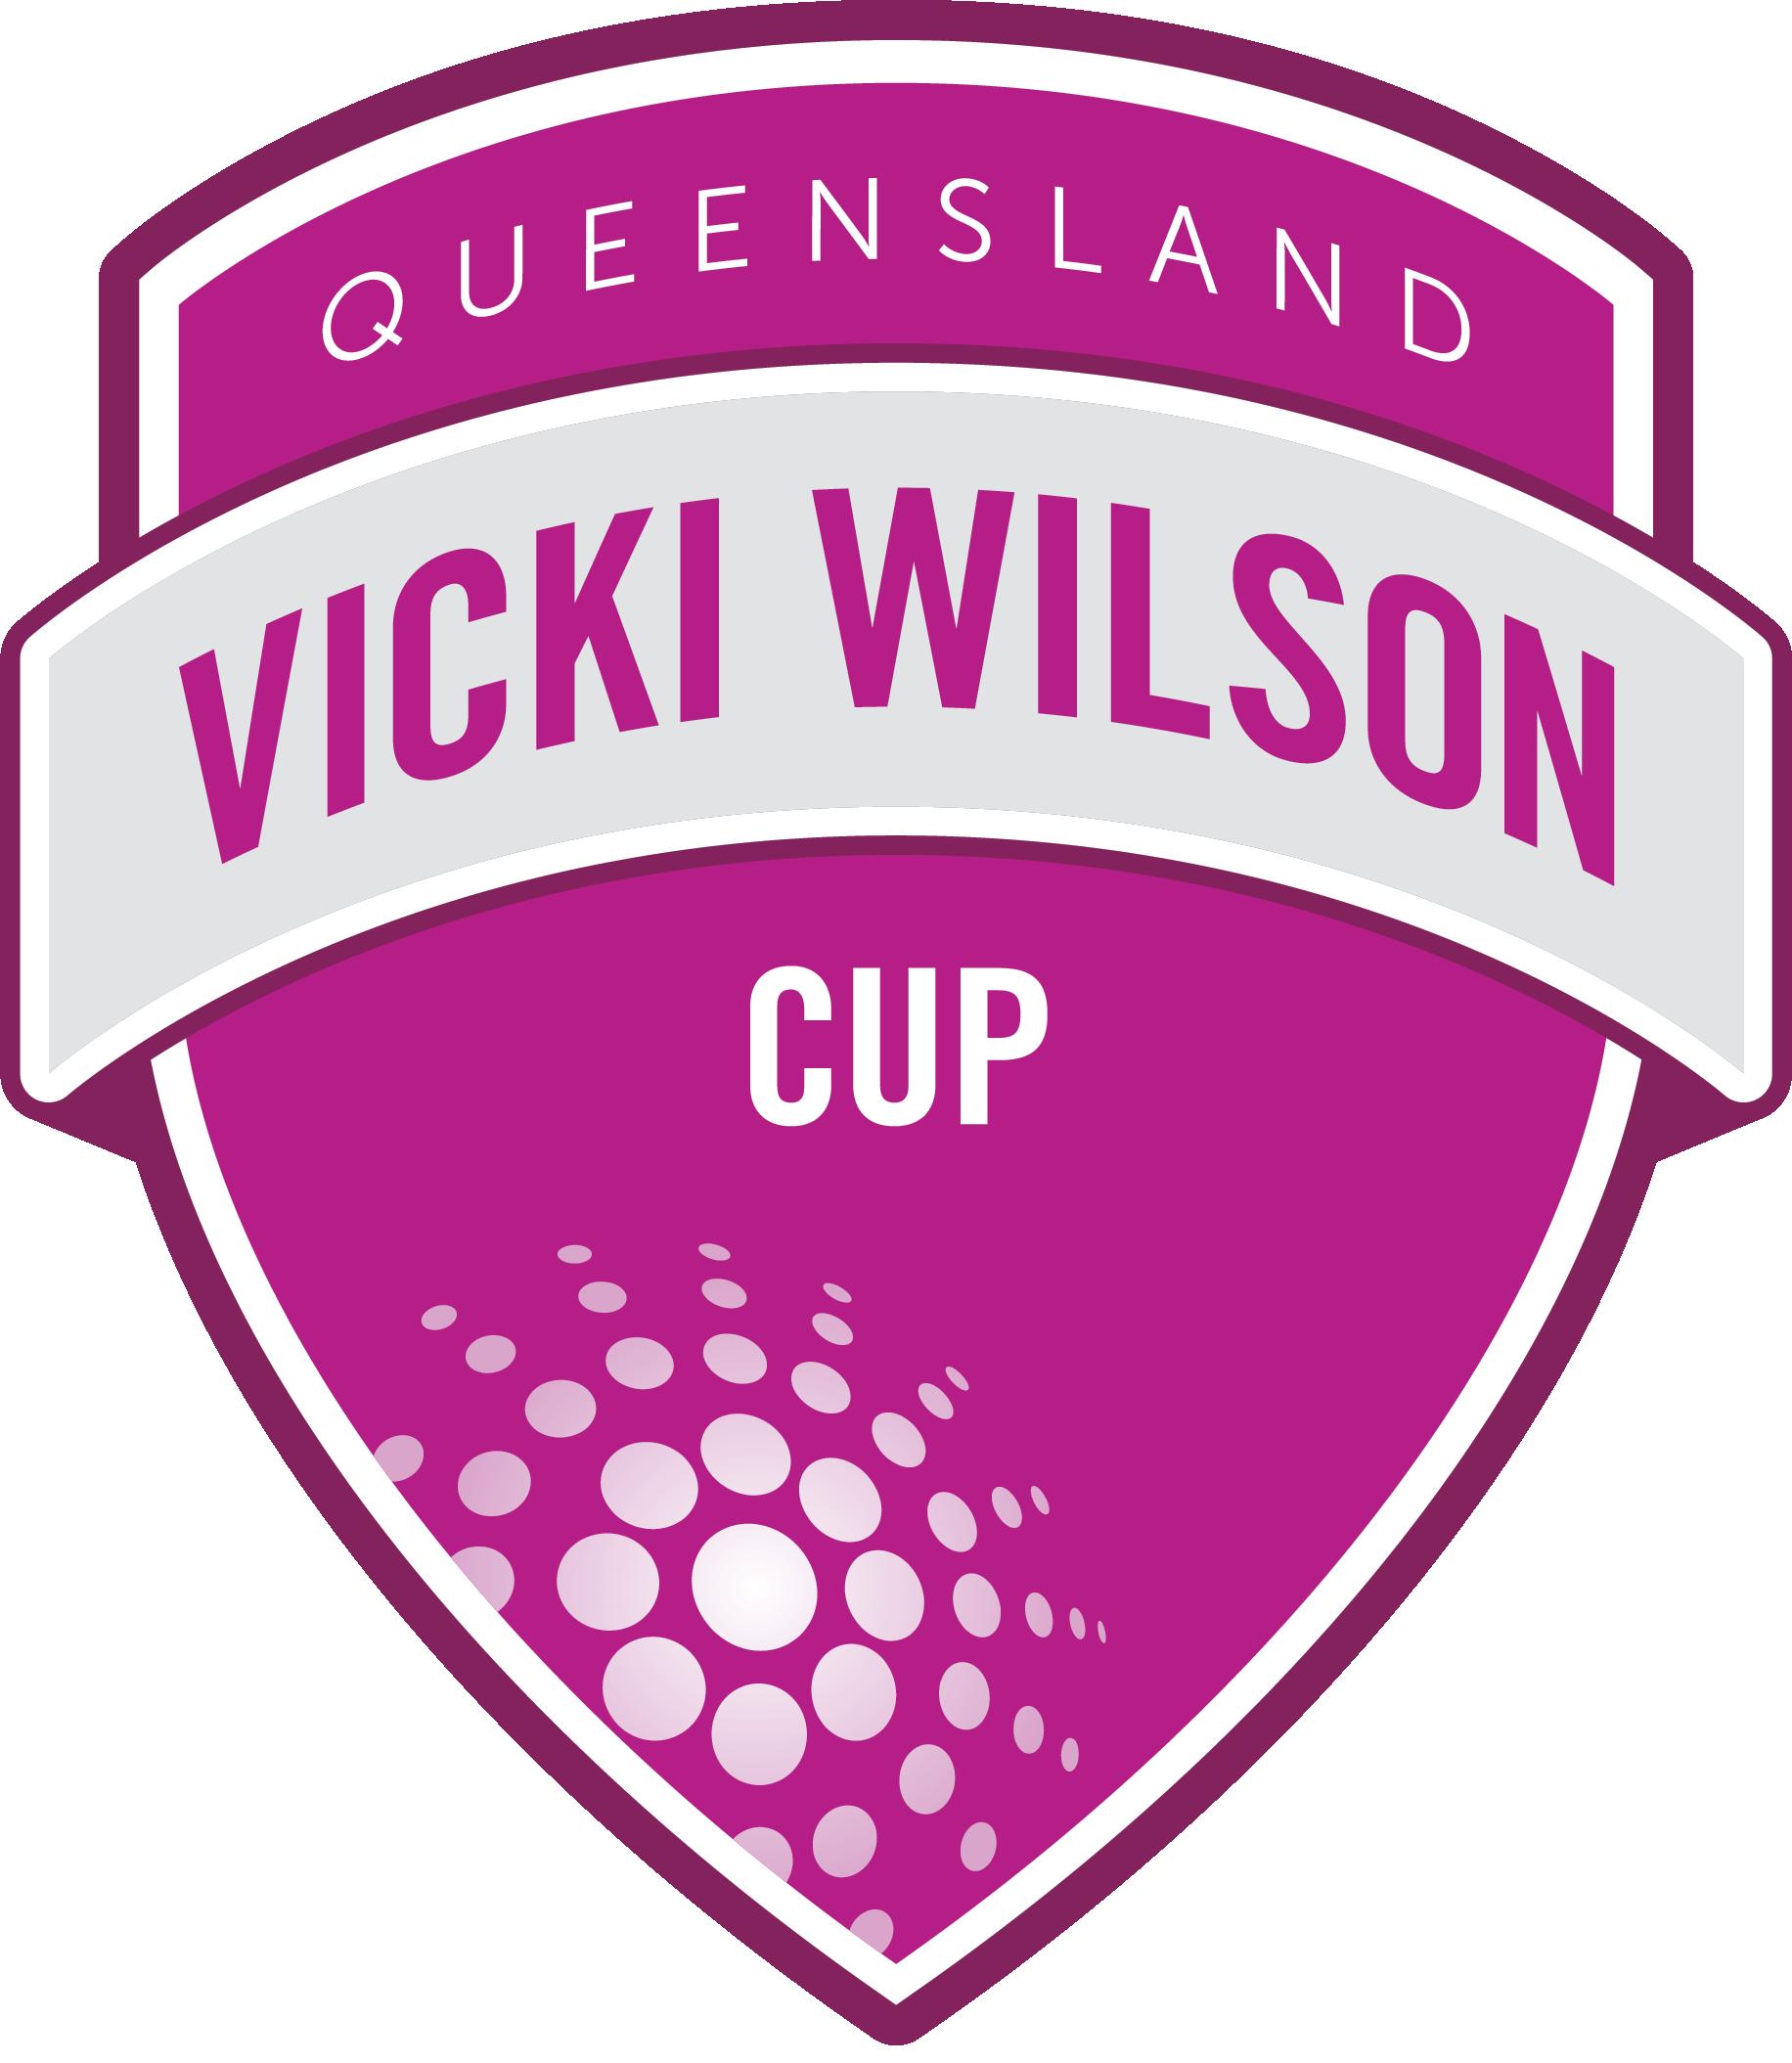 Cup clipart stadium. Vicki wilson championship netball